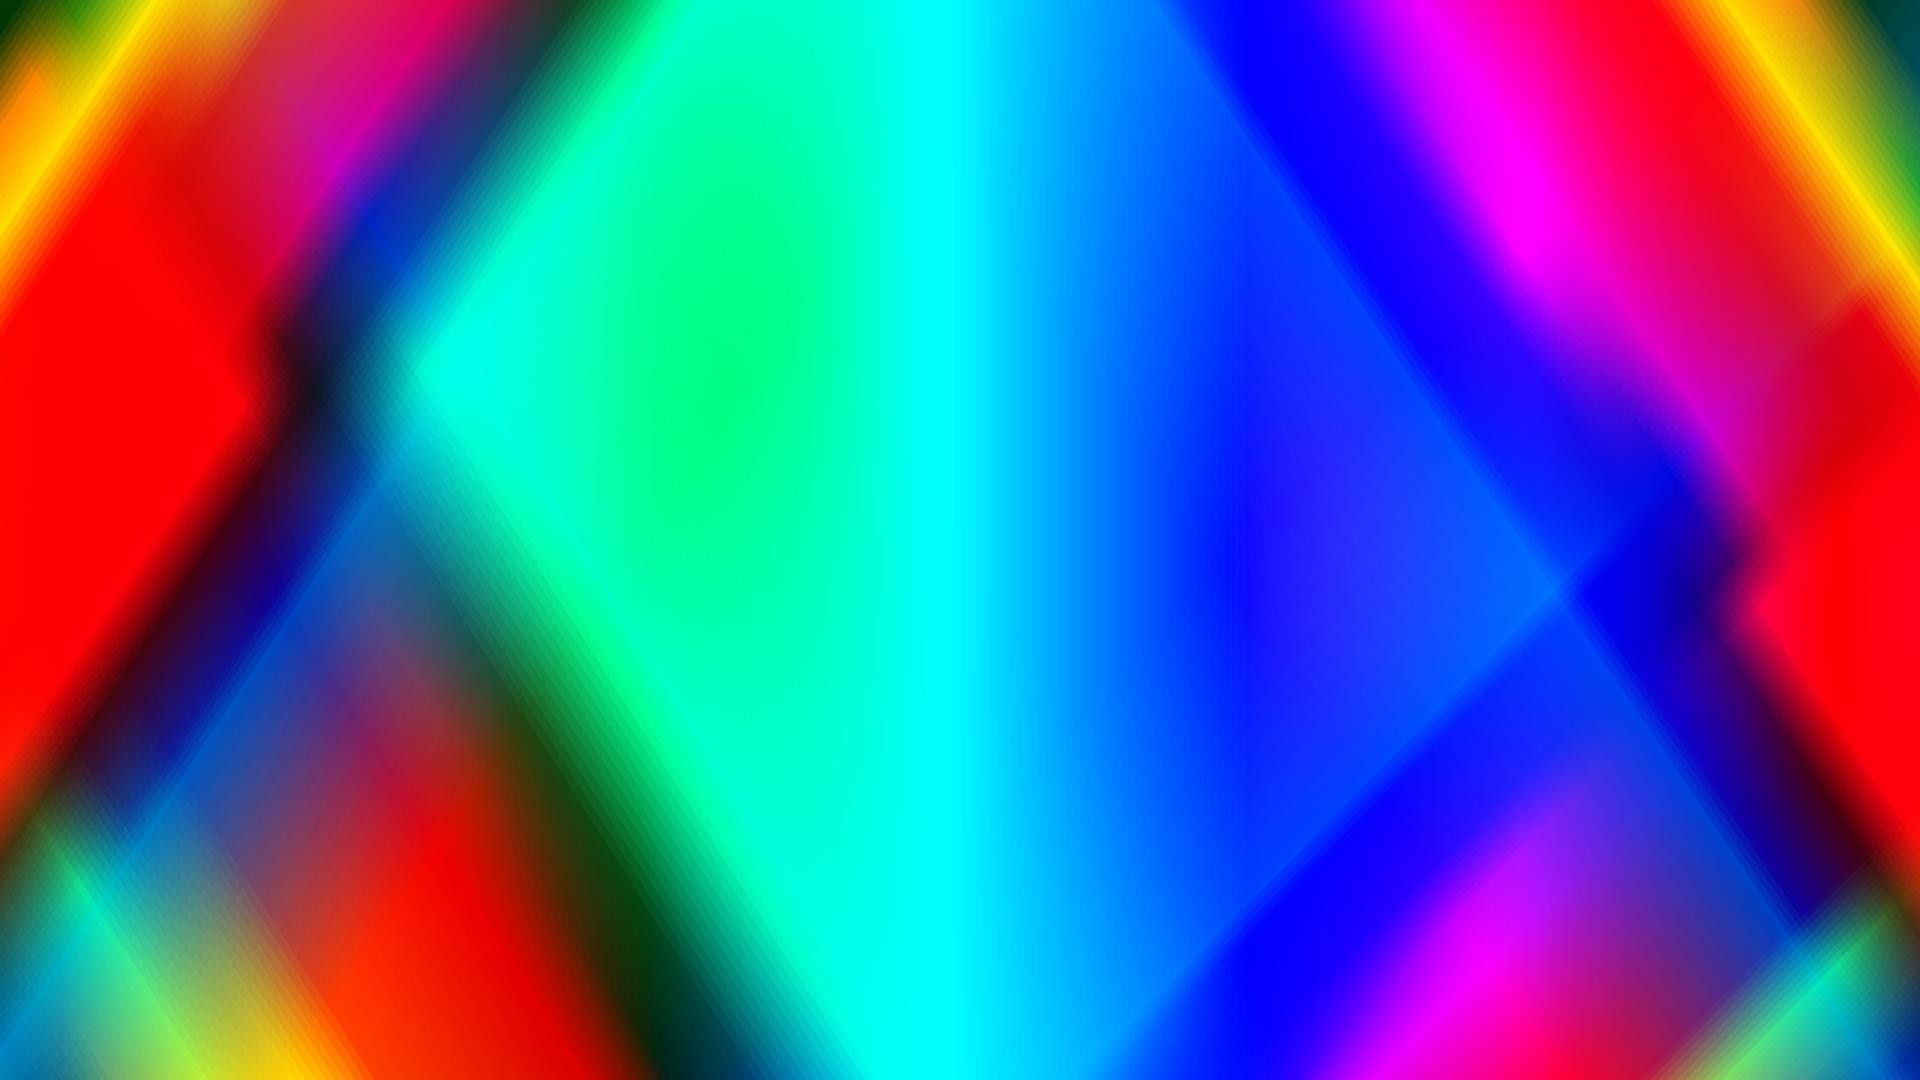 Neon Background by Yvesia on DeviantArt